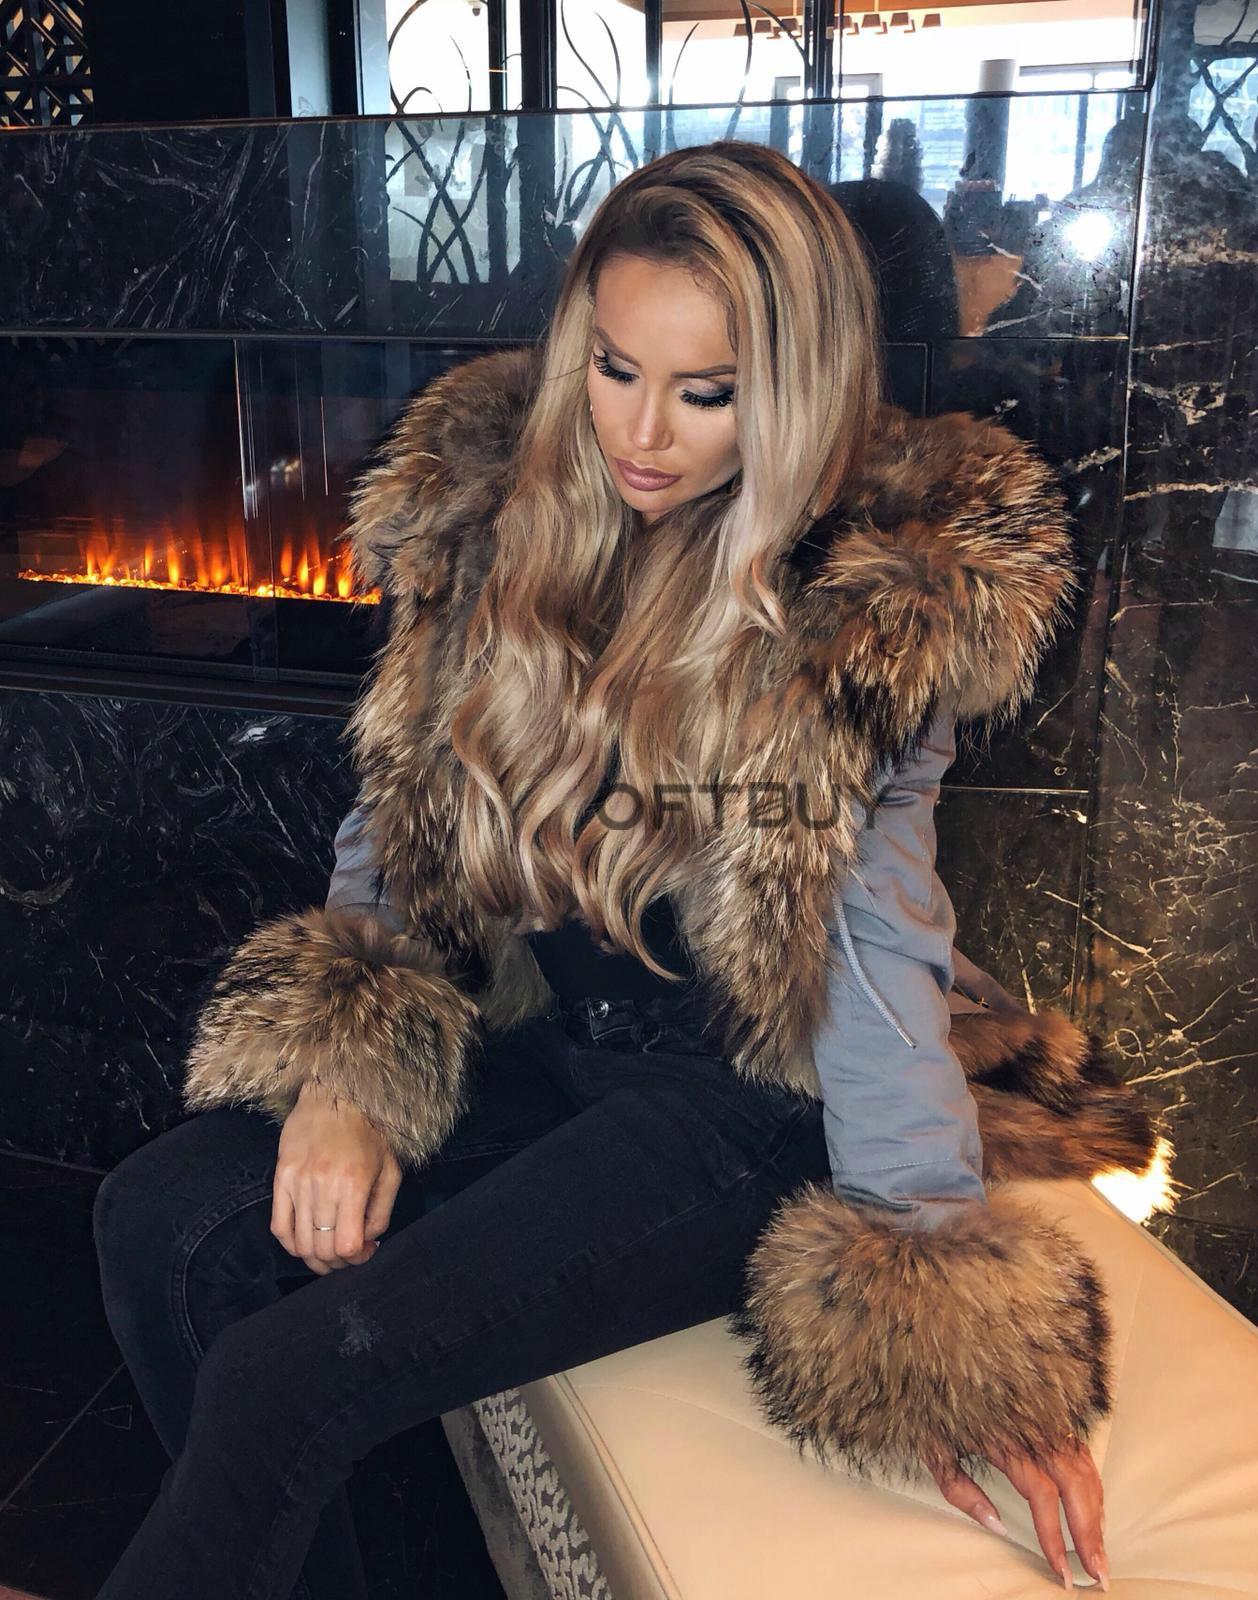 OFTBUY 2019 Real Fur Coat Long Parka Winter Jacket Women Natural Raccoon Fur Collar Real Fox Fur Liner Detachable Streetwear New